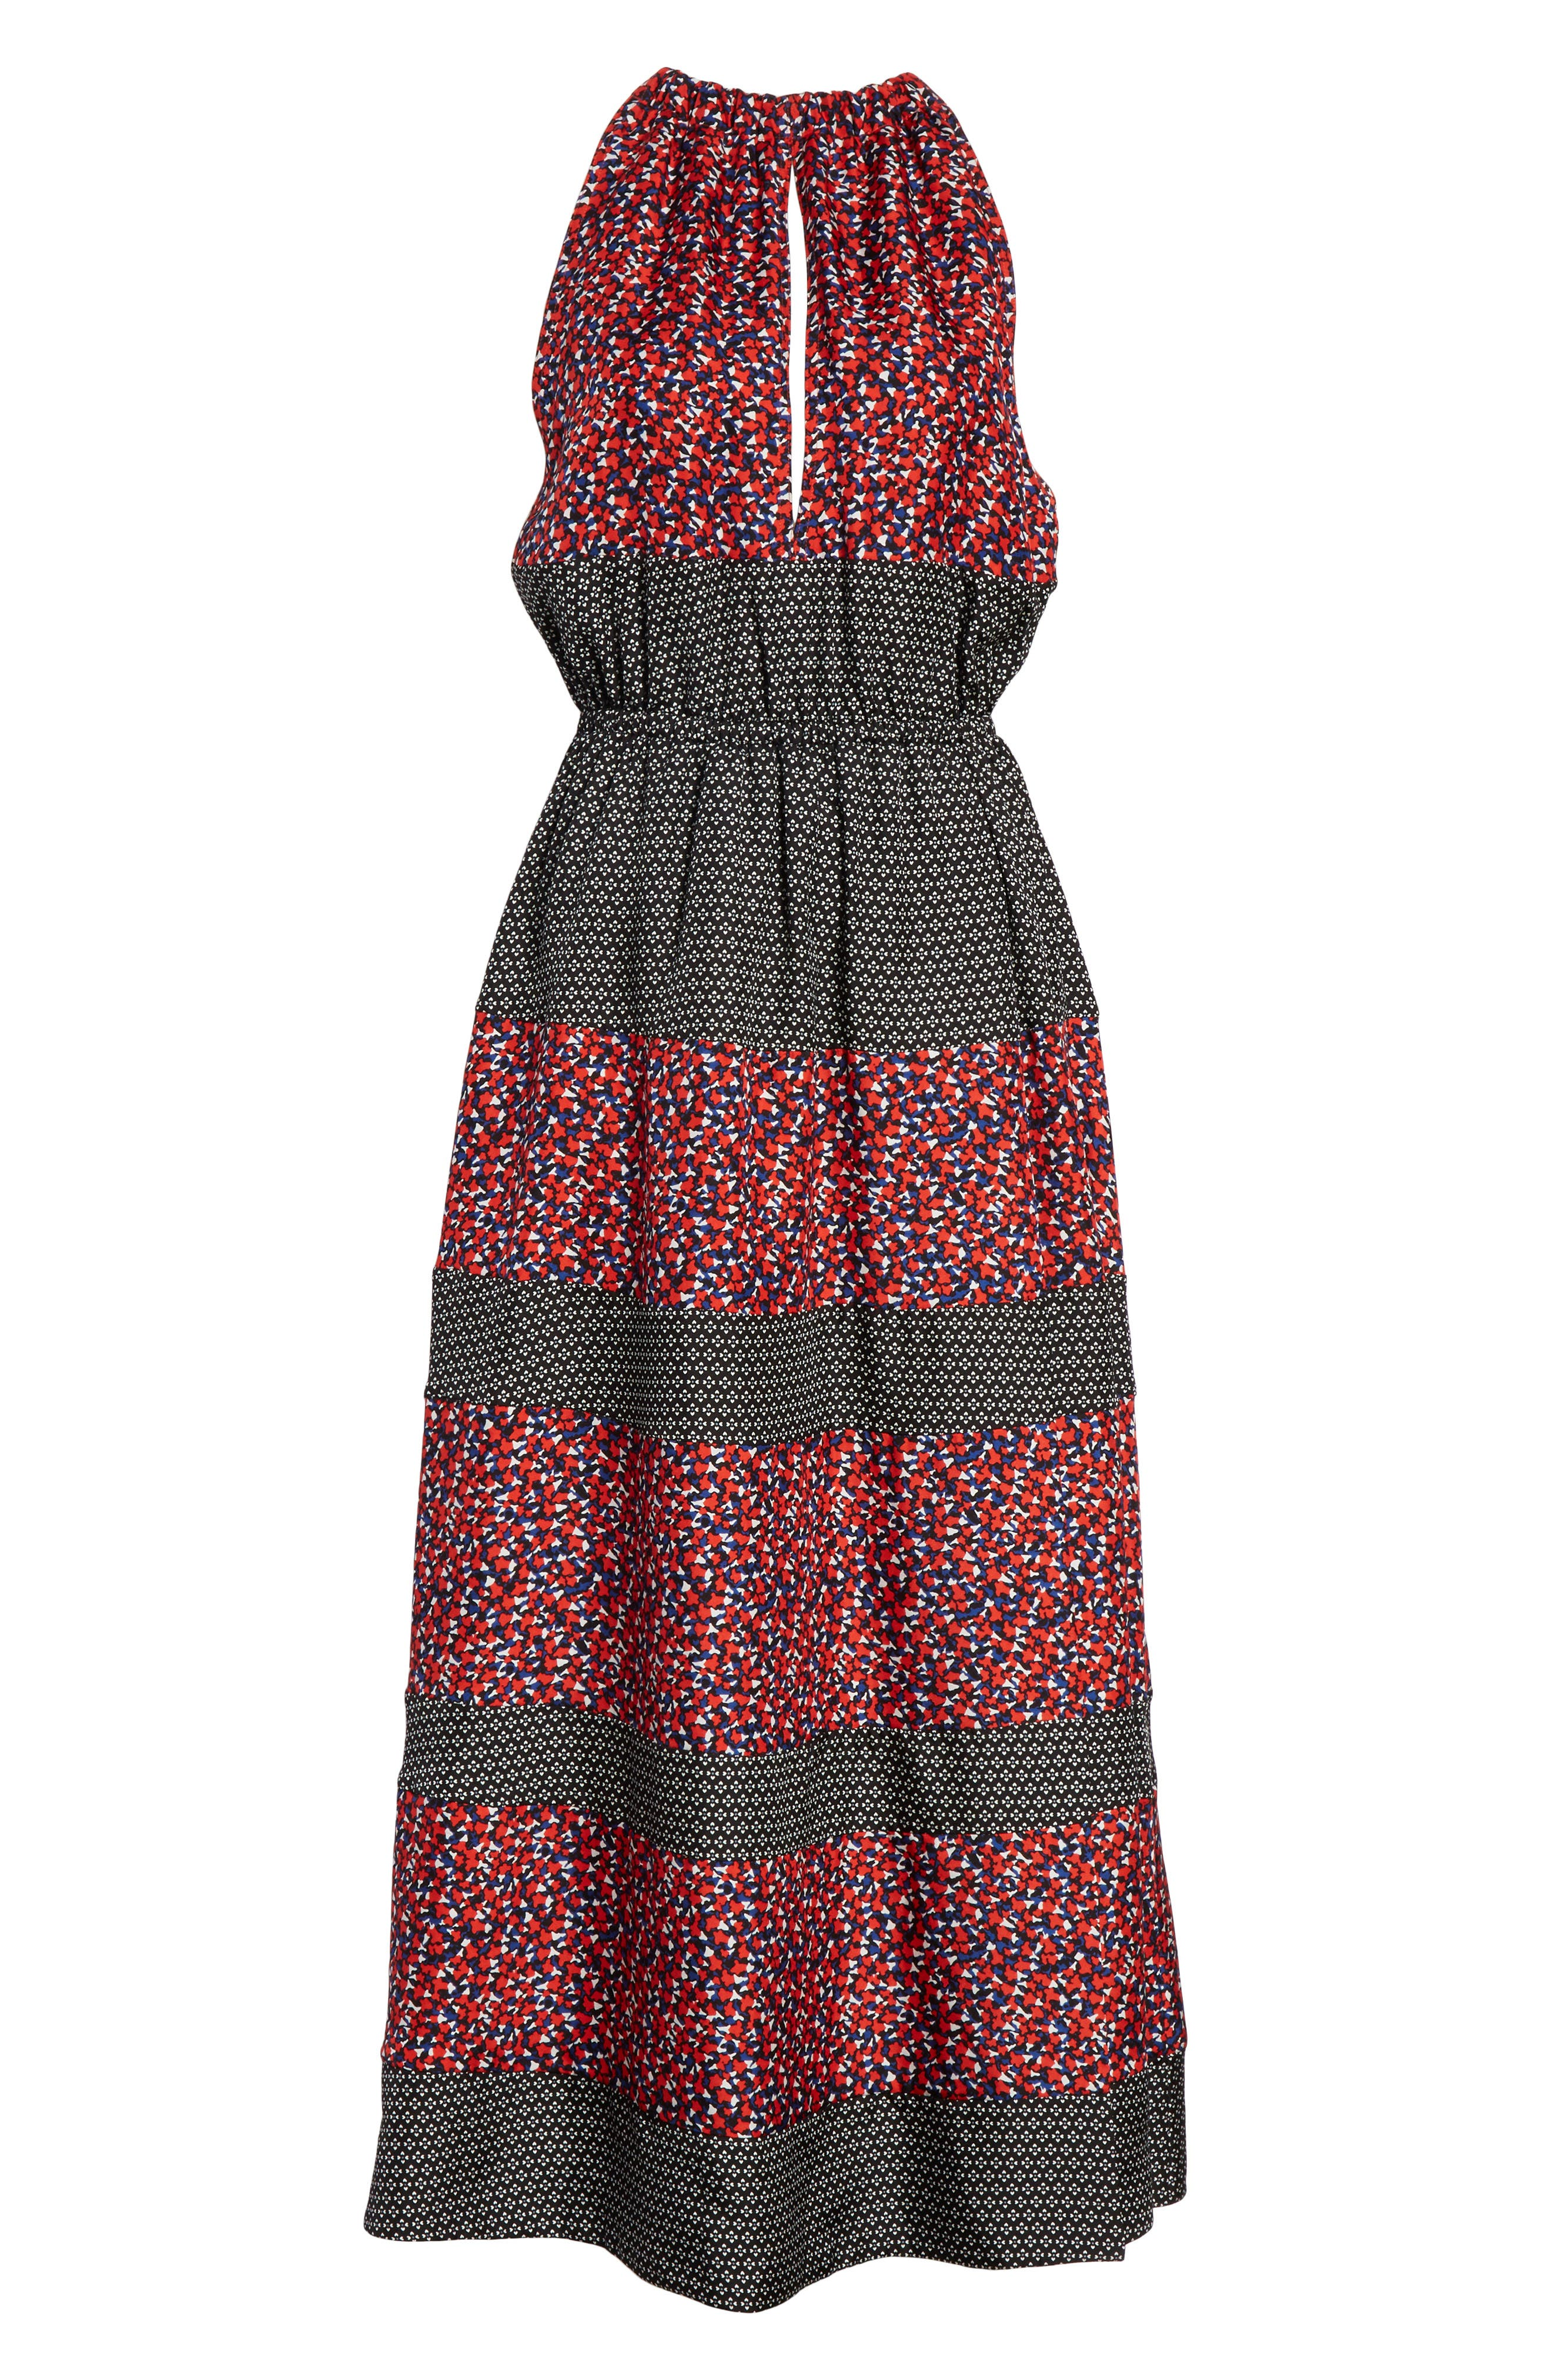 Mixed Print Halter Dress,                             Alternate thumbnail 6, color,                             Black Camp Floral